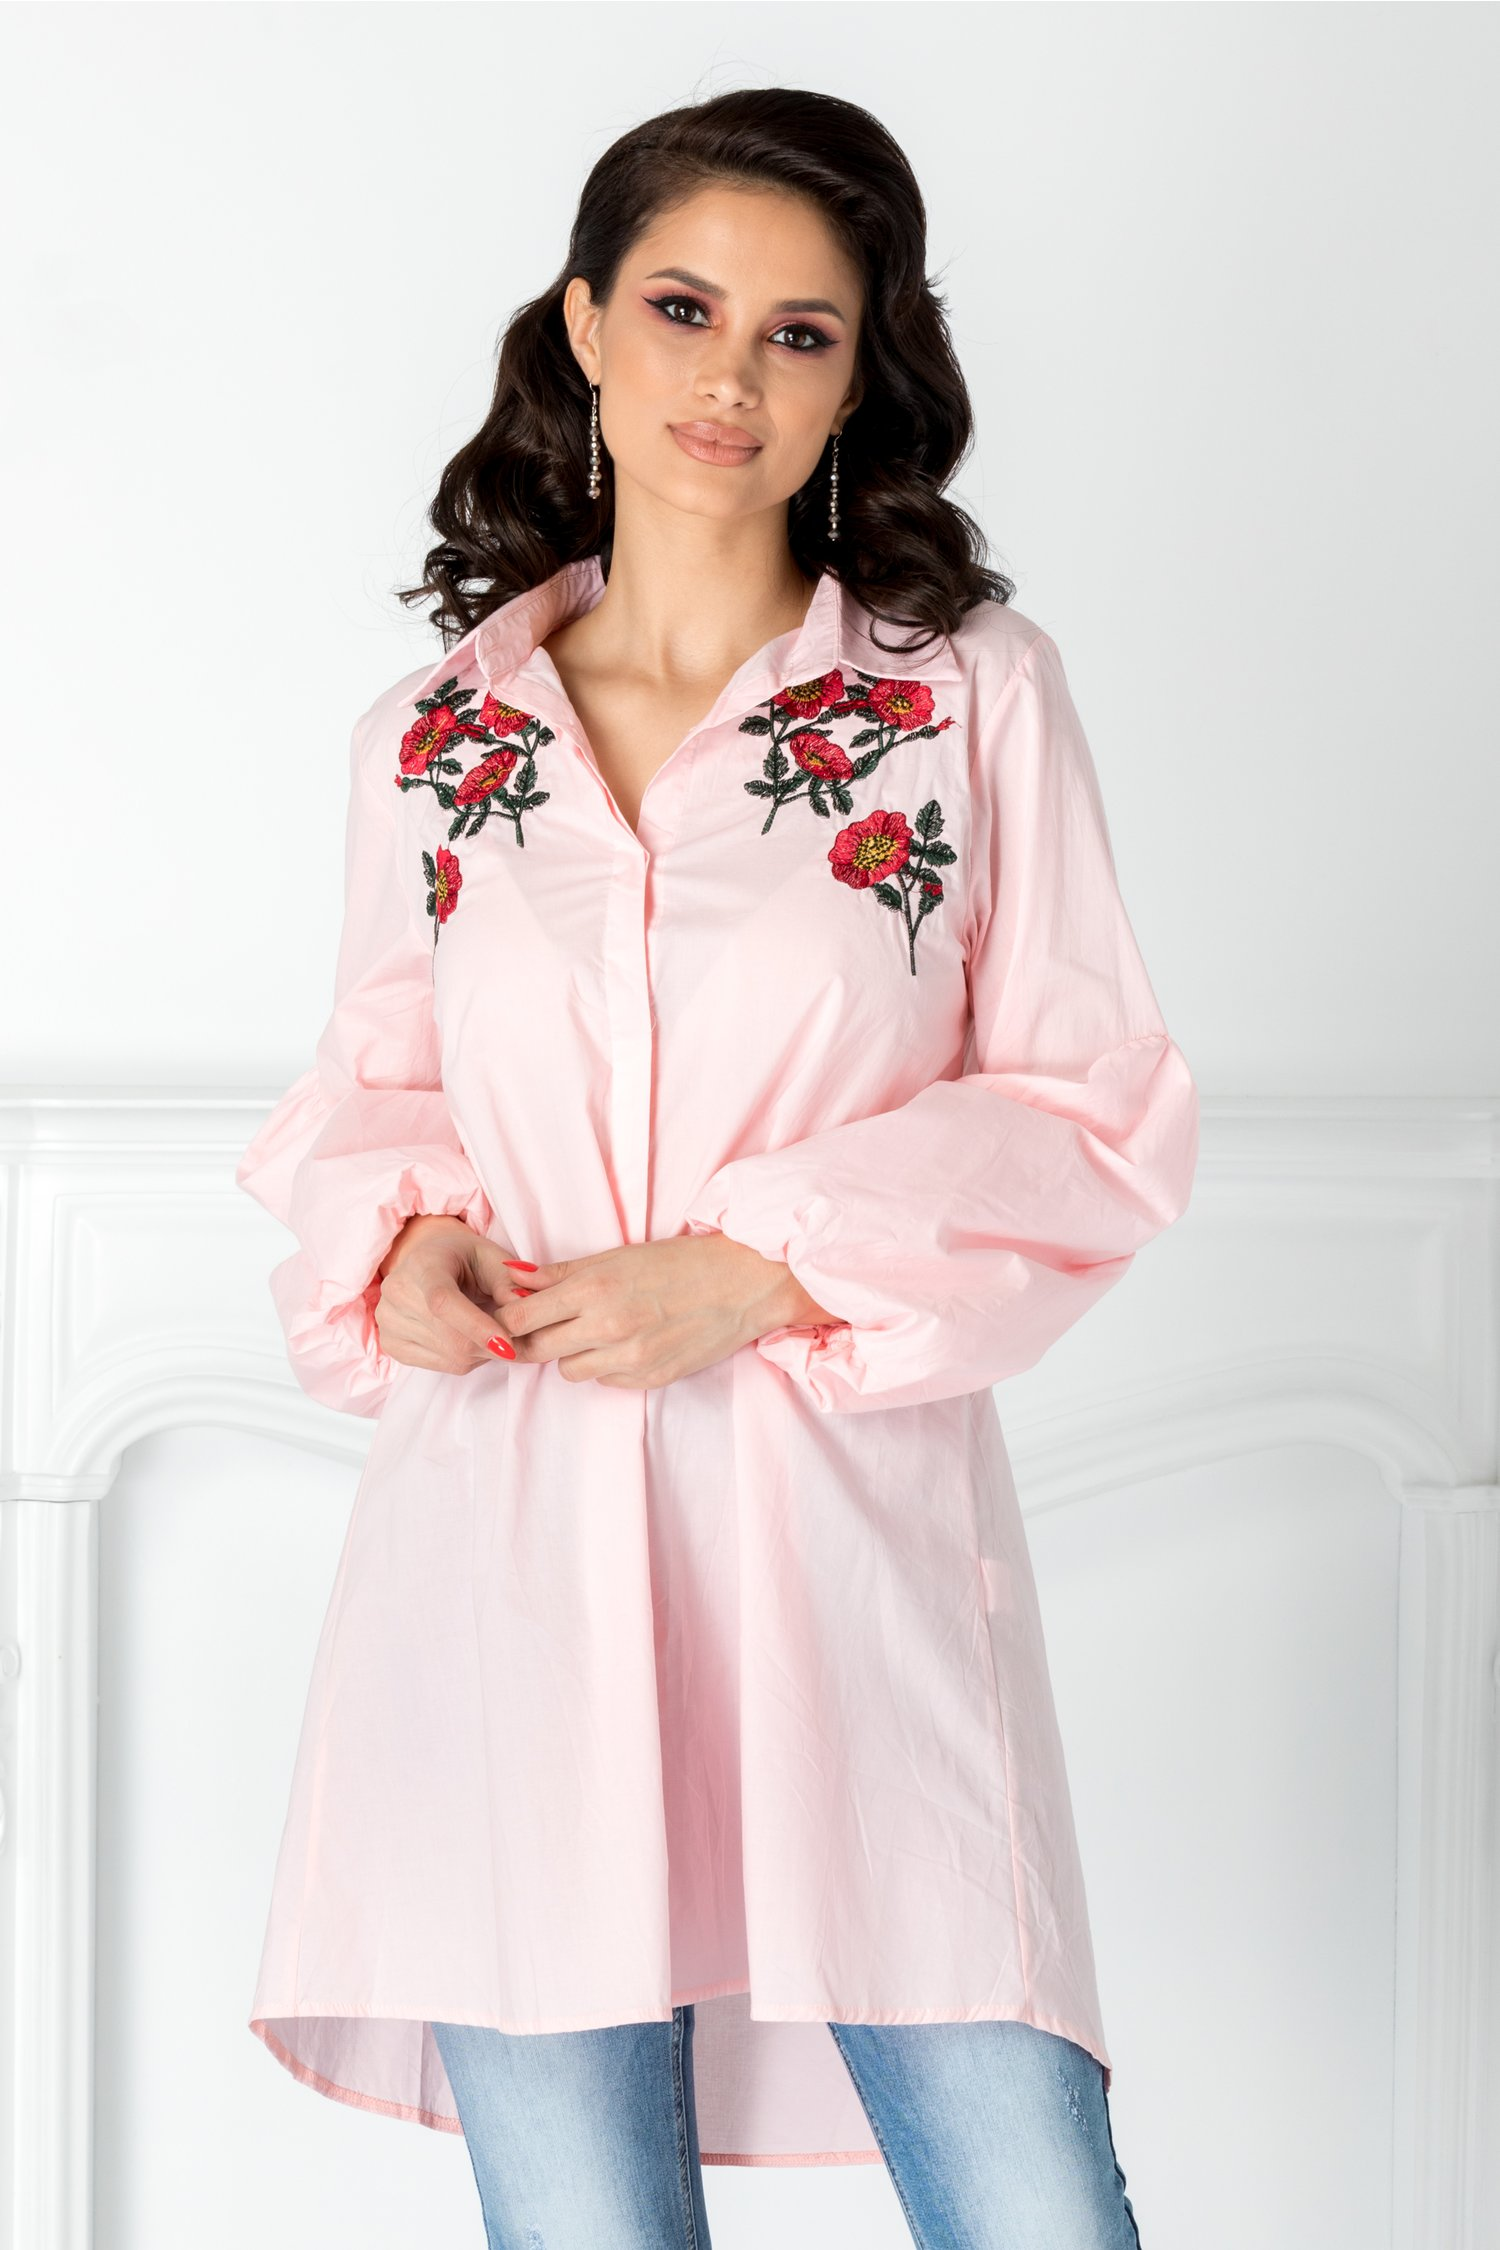 Camasa roz cu flori brodate la bust